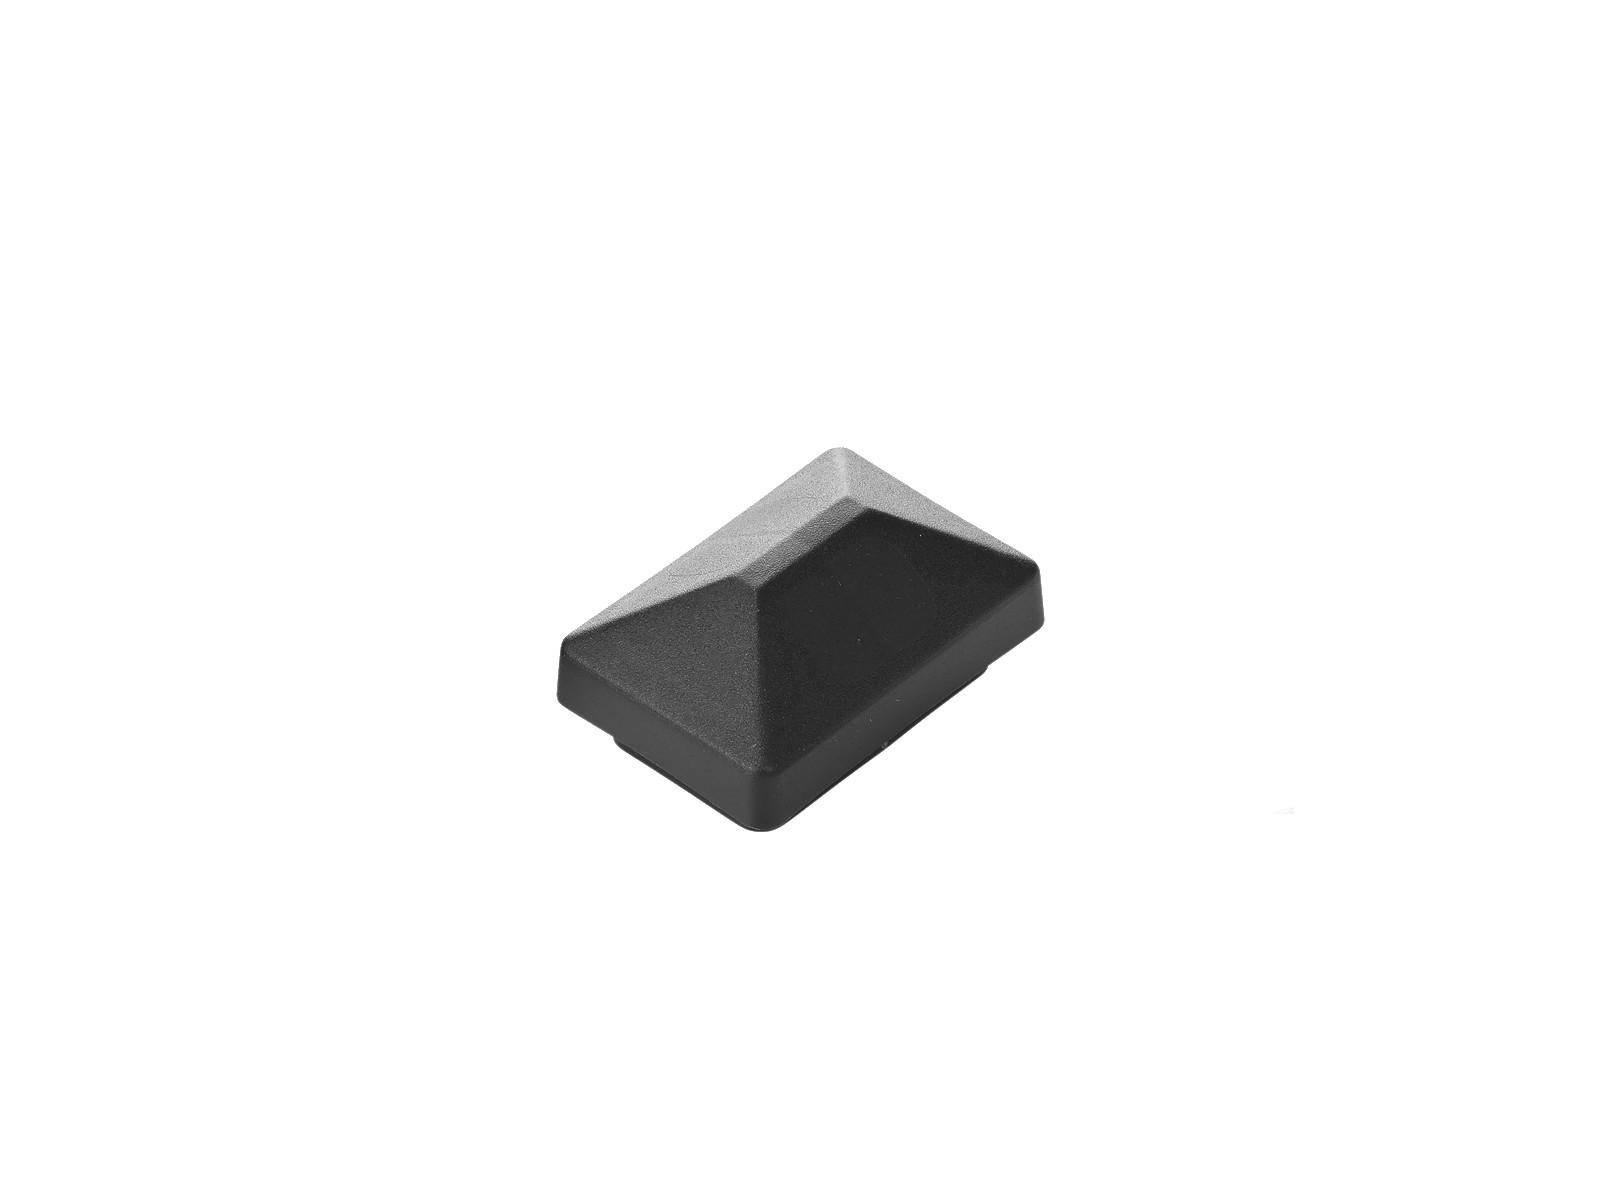 Abdeckkappe 60 x 40 mm schwarz